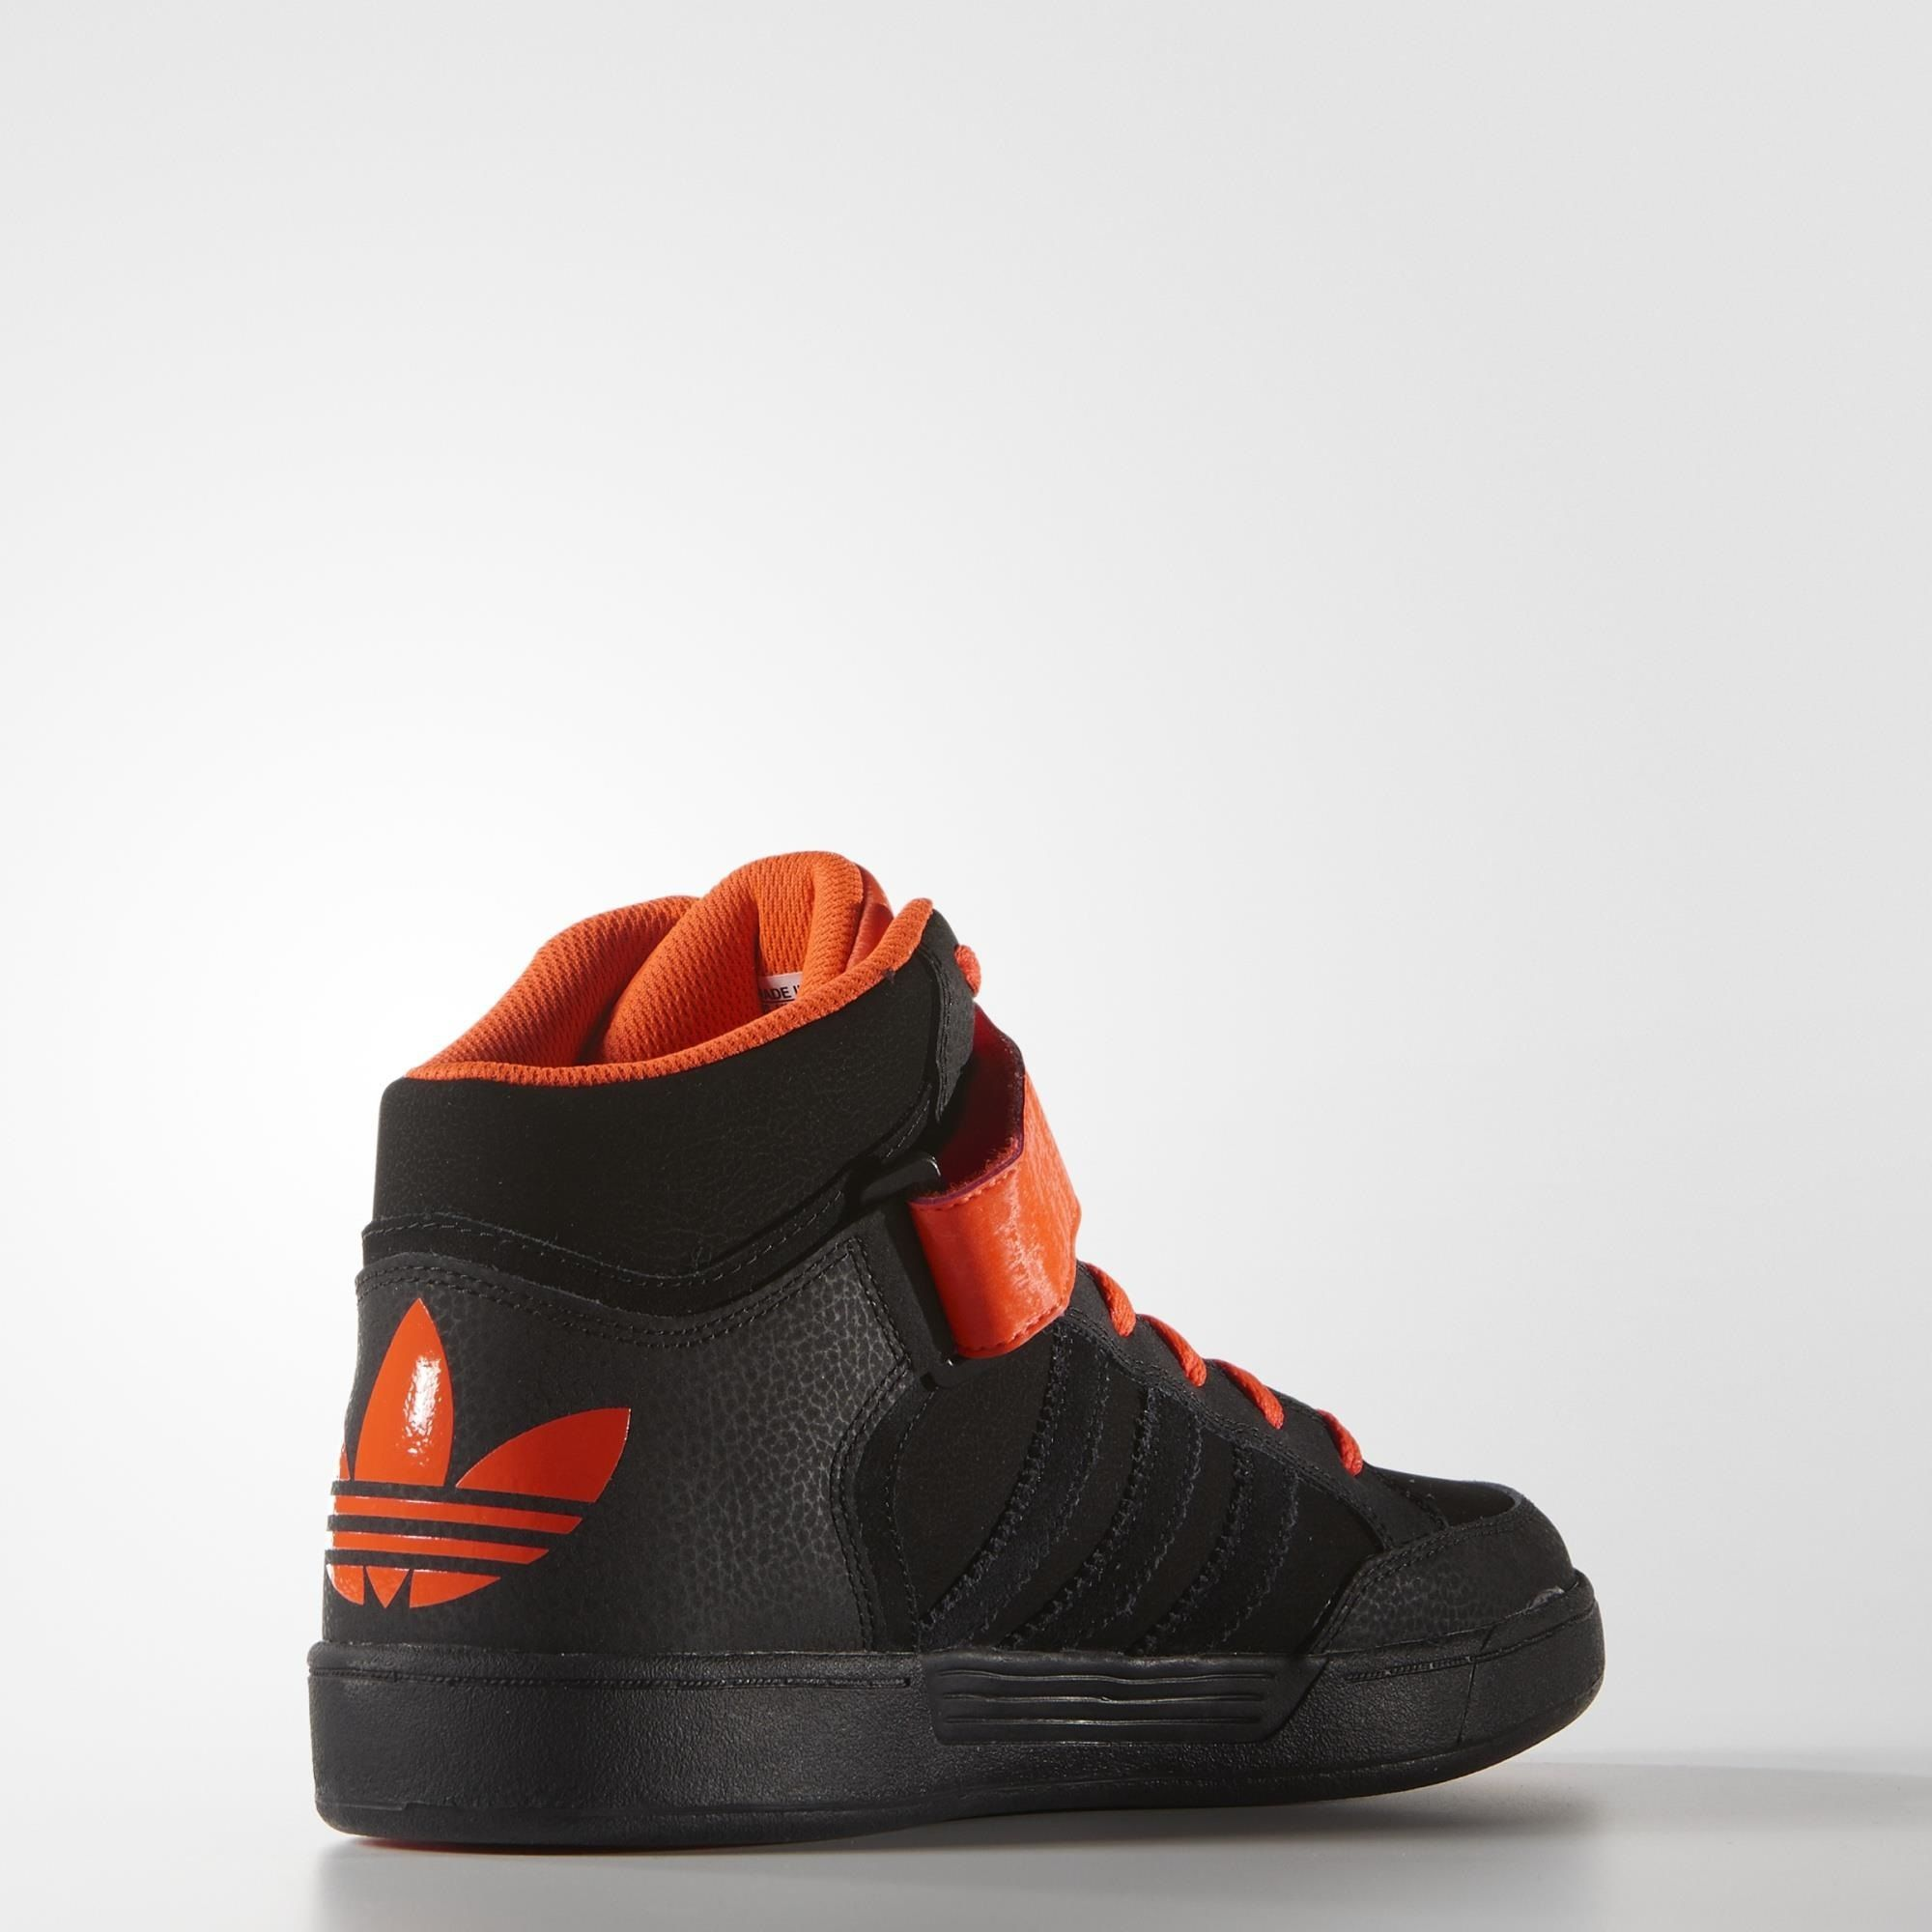 adidas Varial Mid shoes white black